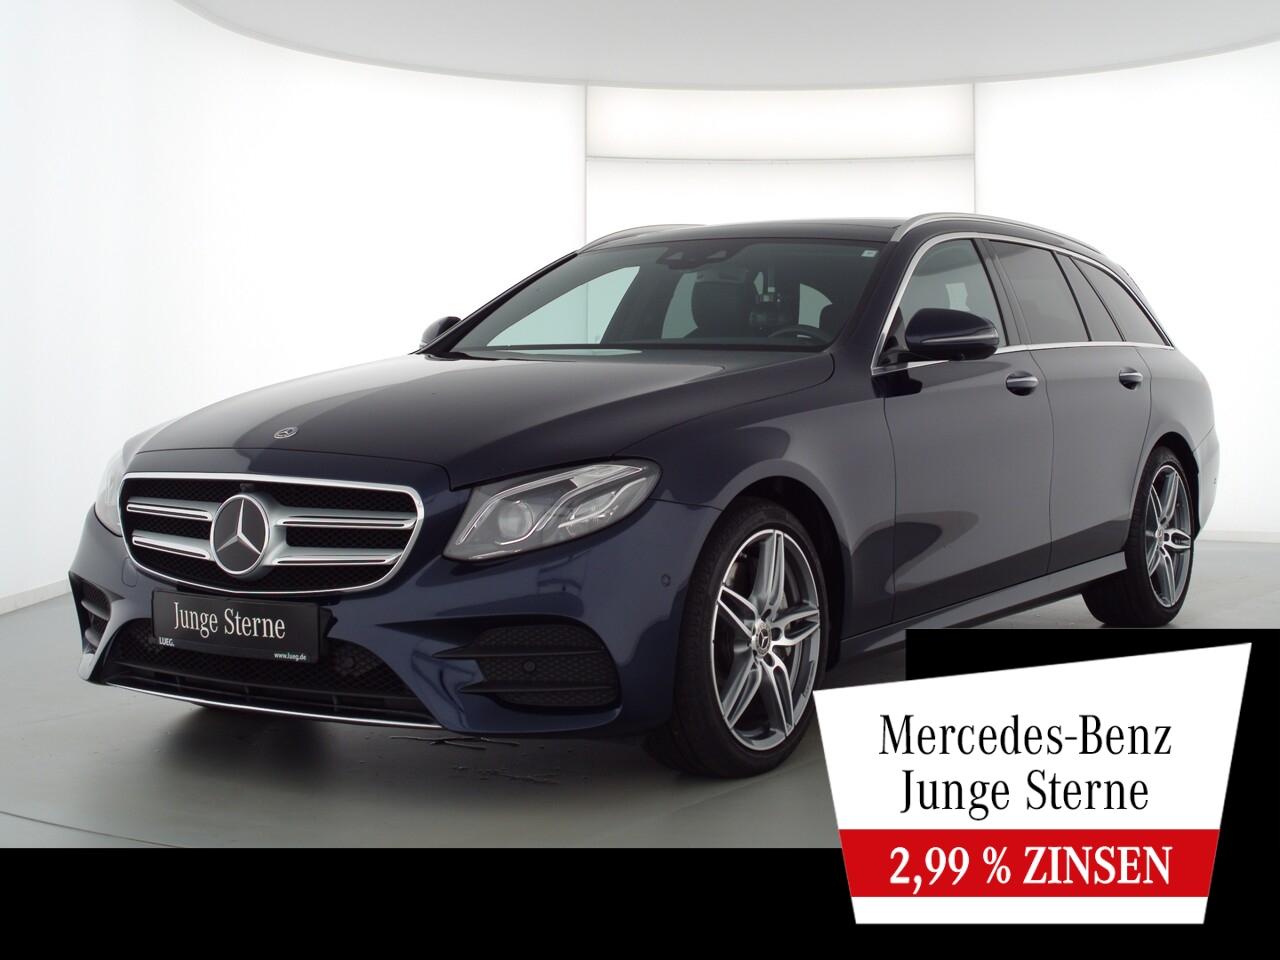 Mercedes-Benz E 350 d T 4M AMG+COM+Pano+Burm+Mbeam+AHK+HUD+360, Jahr 2018, Diesel